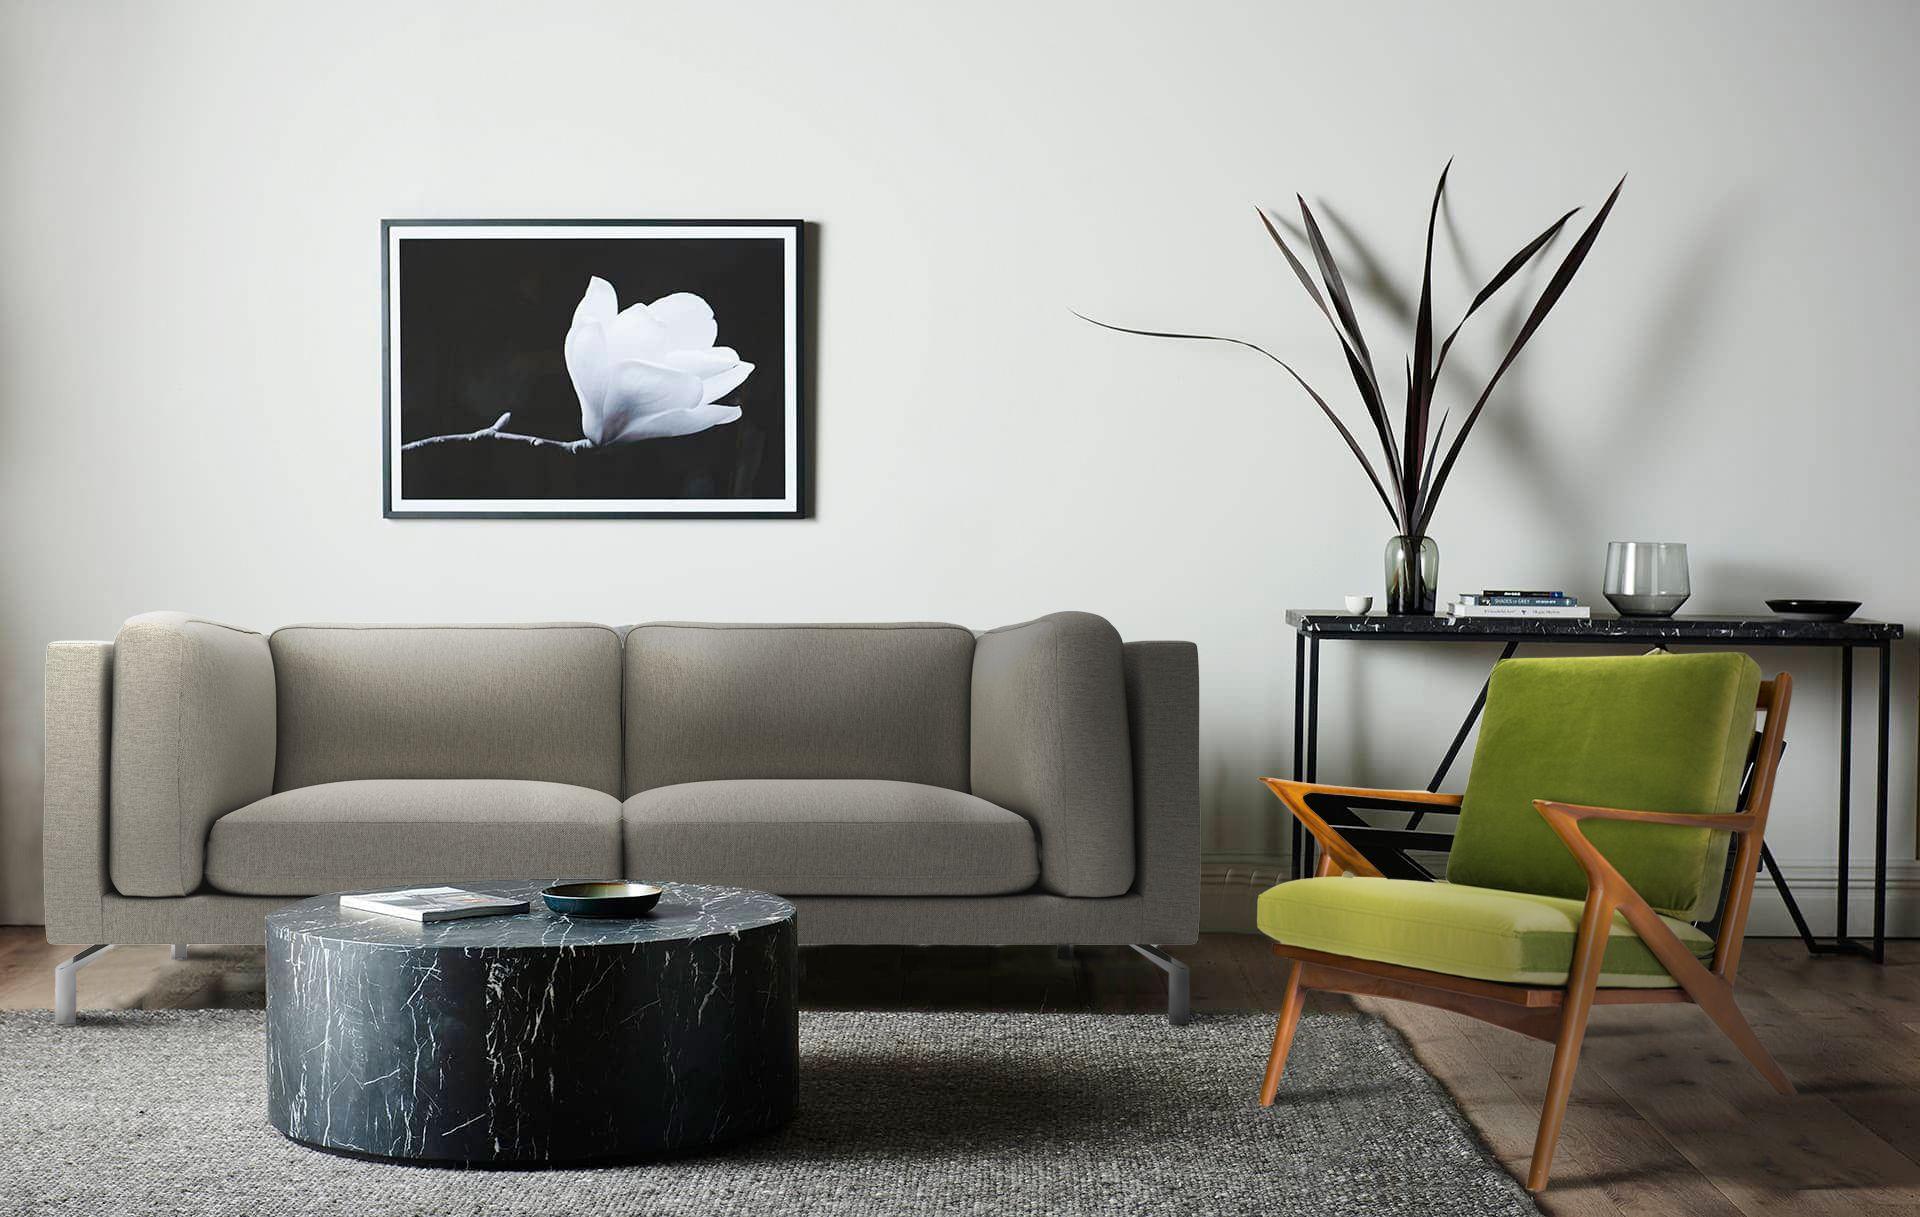 our malmo sofa is modern sleek and comfortable perfect blend of rh pinterest com sleek modern furniture promo code sleek modern furniture coupon code